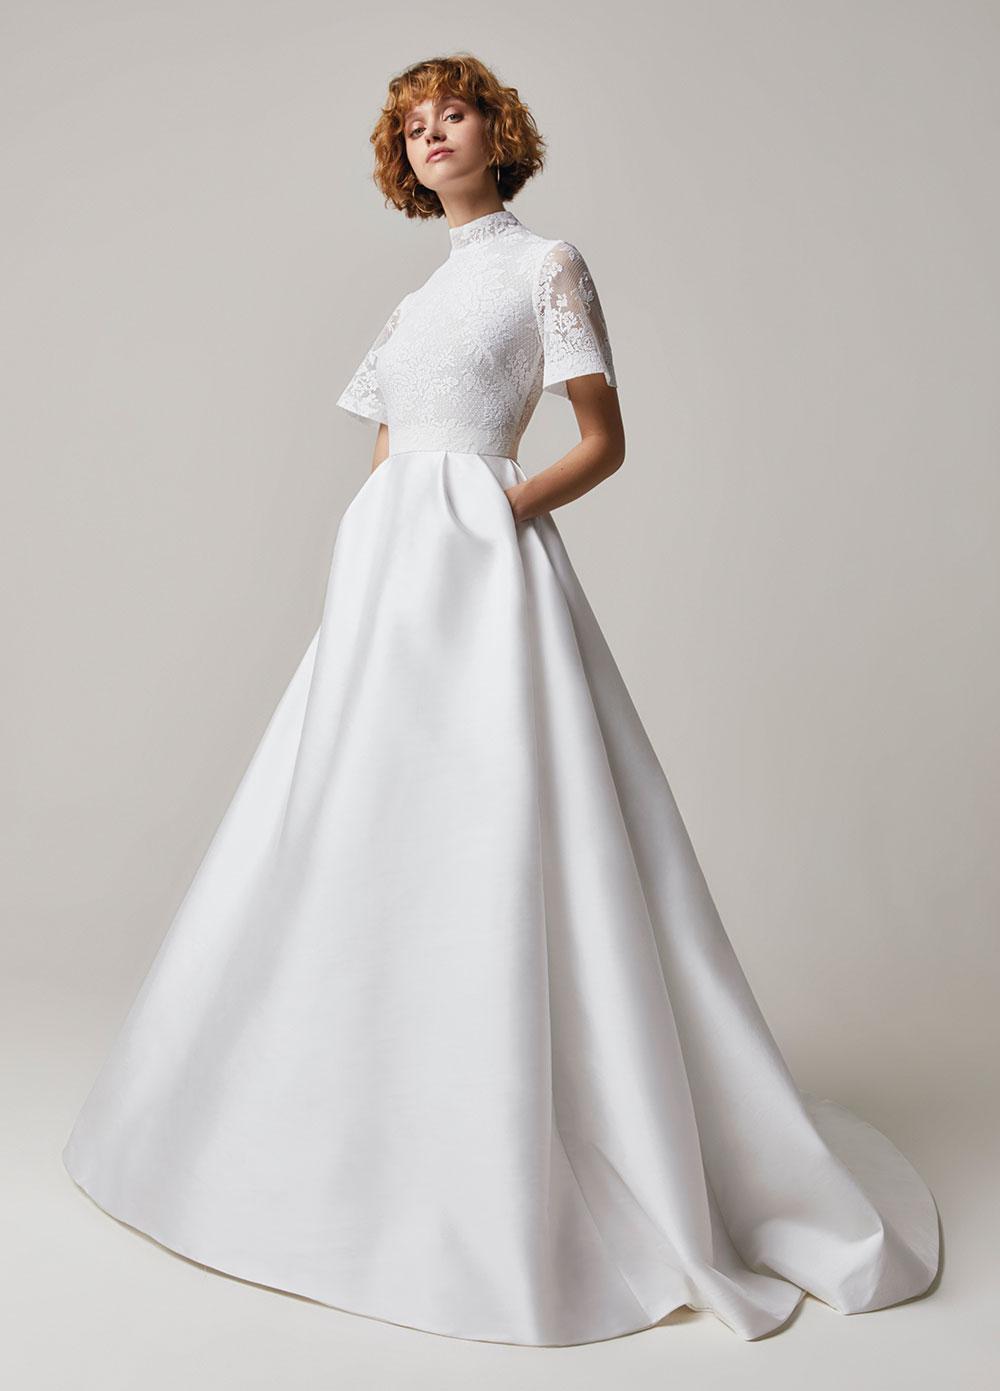 Jesus Peiro 204 wedding dress at Miss Bush, London Surrey UK